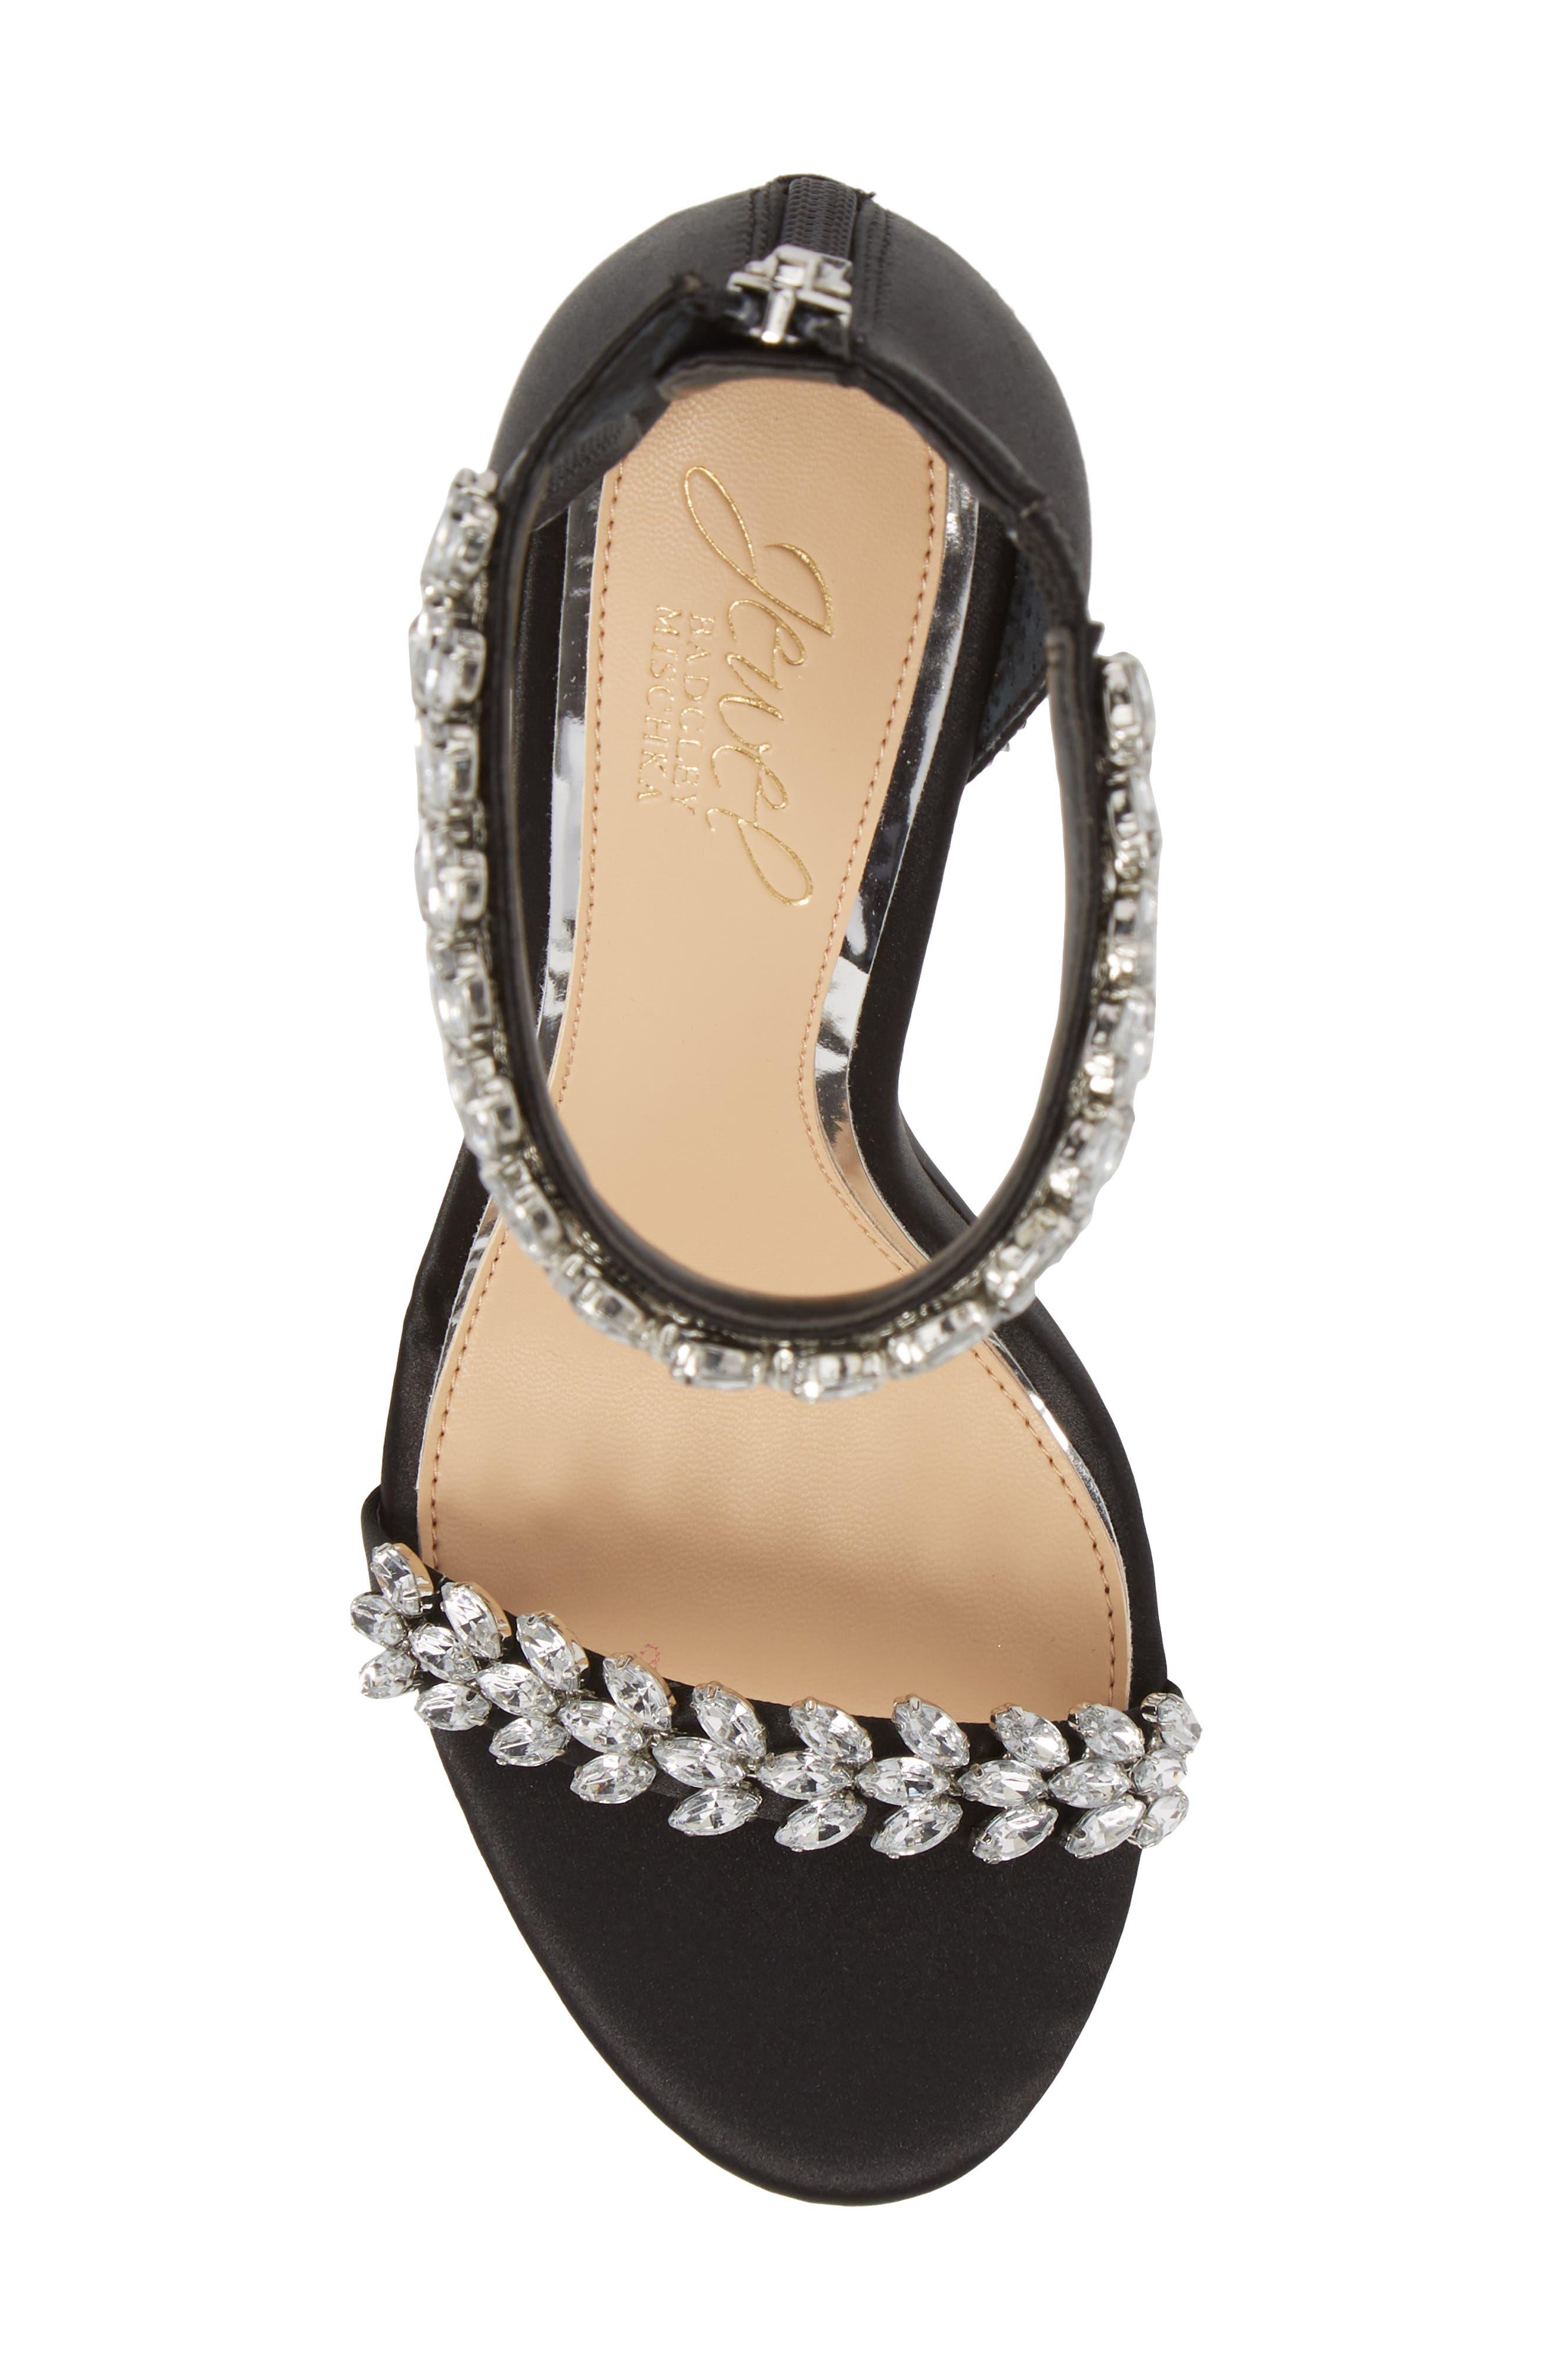 Jewel by Badgley Mischka Mayra Embellished Ankle Strap Sandal,                             Alternate thumbnail 5, color,                             BLACK SATIN